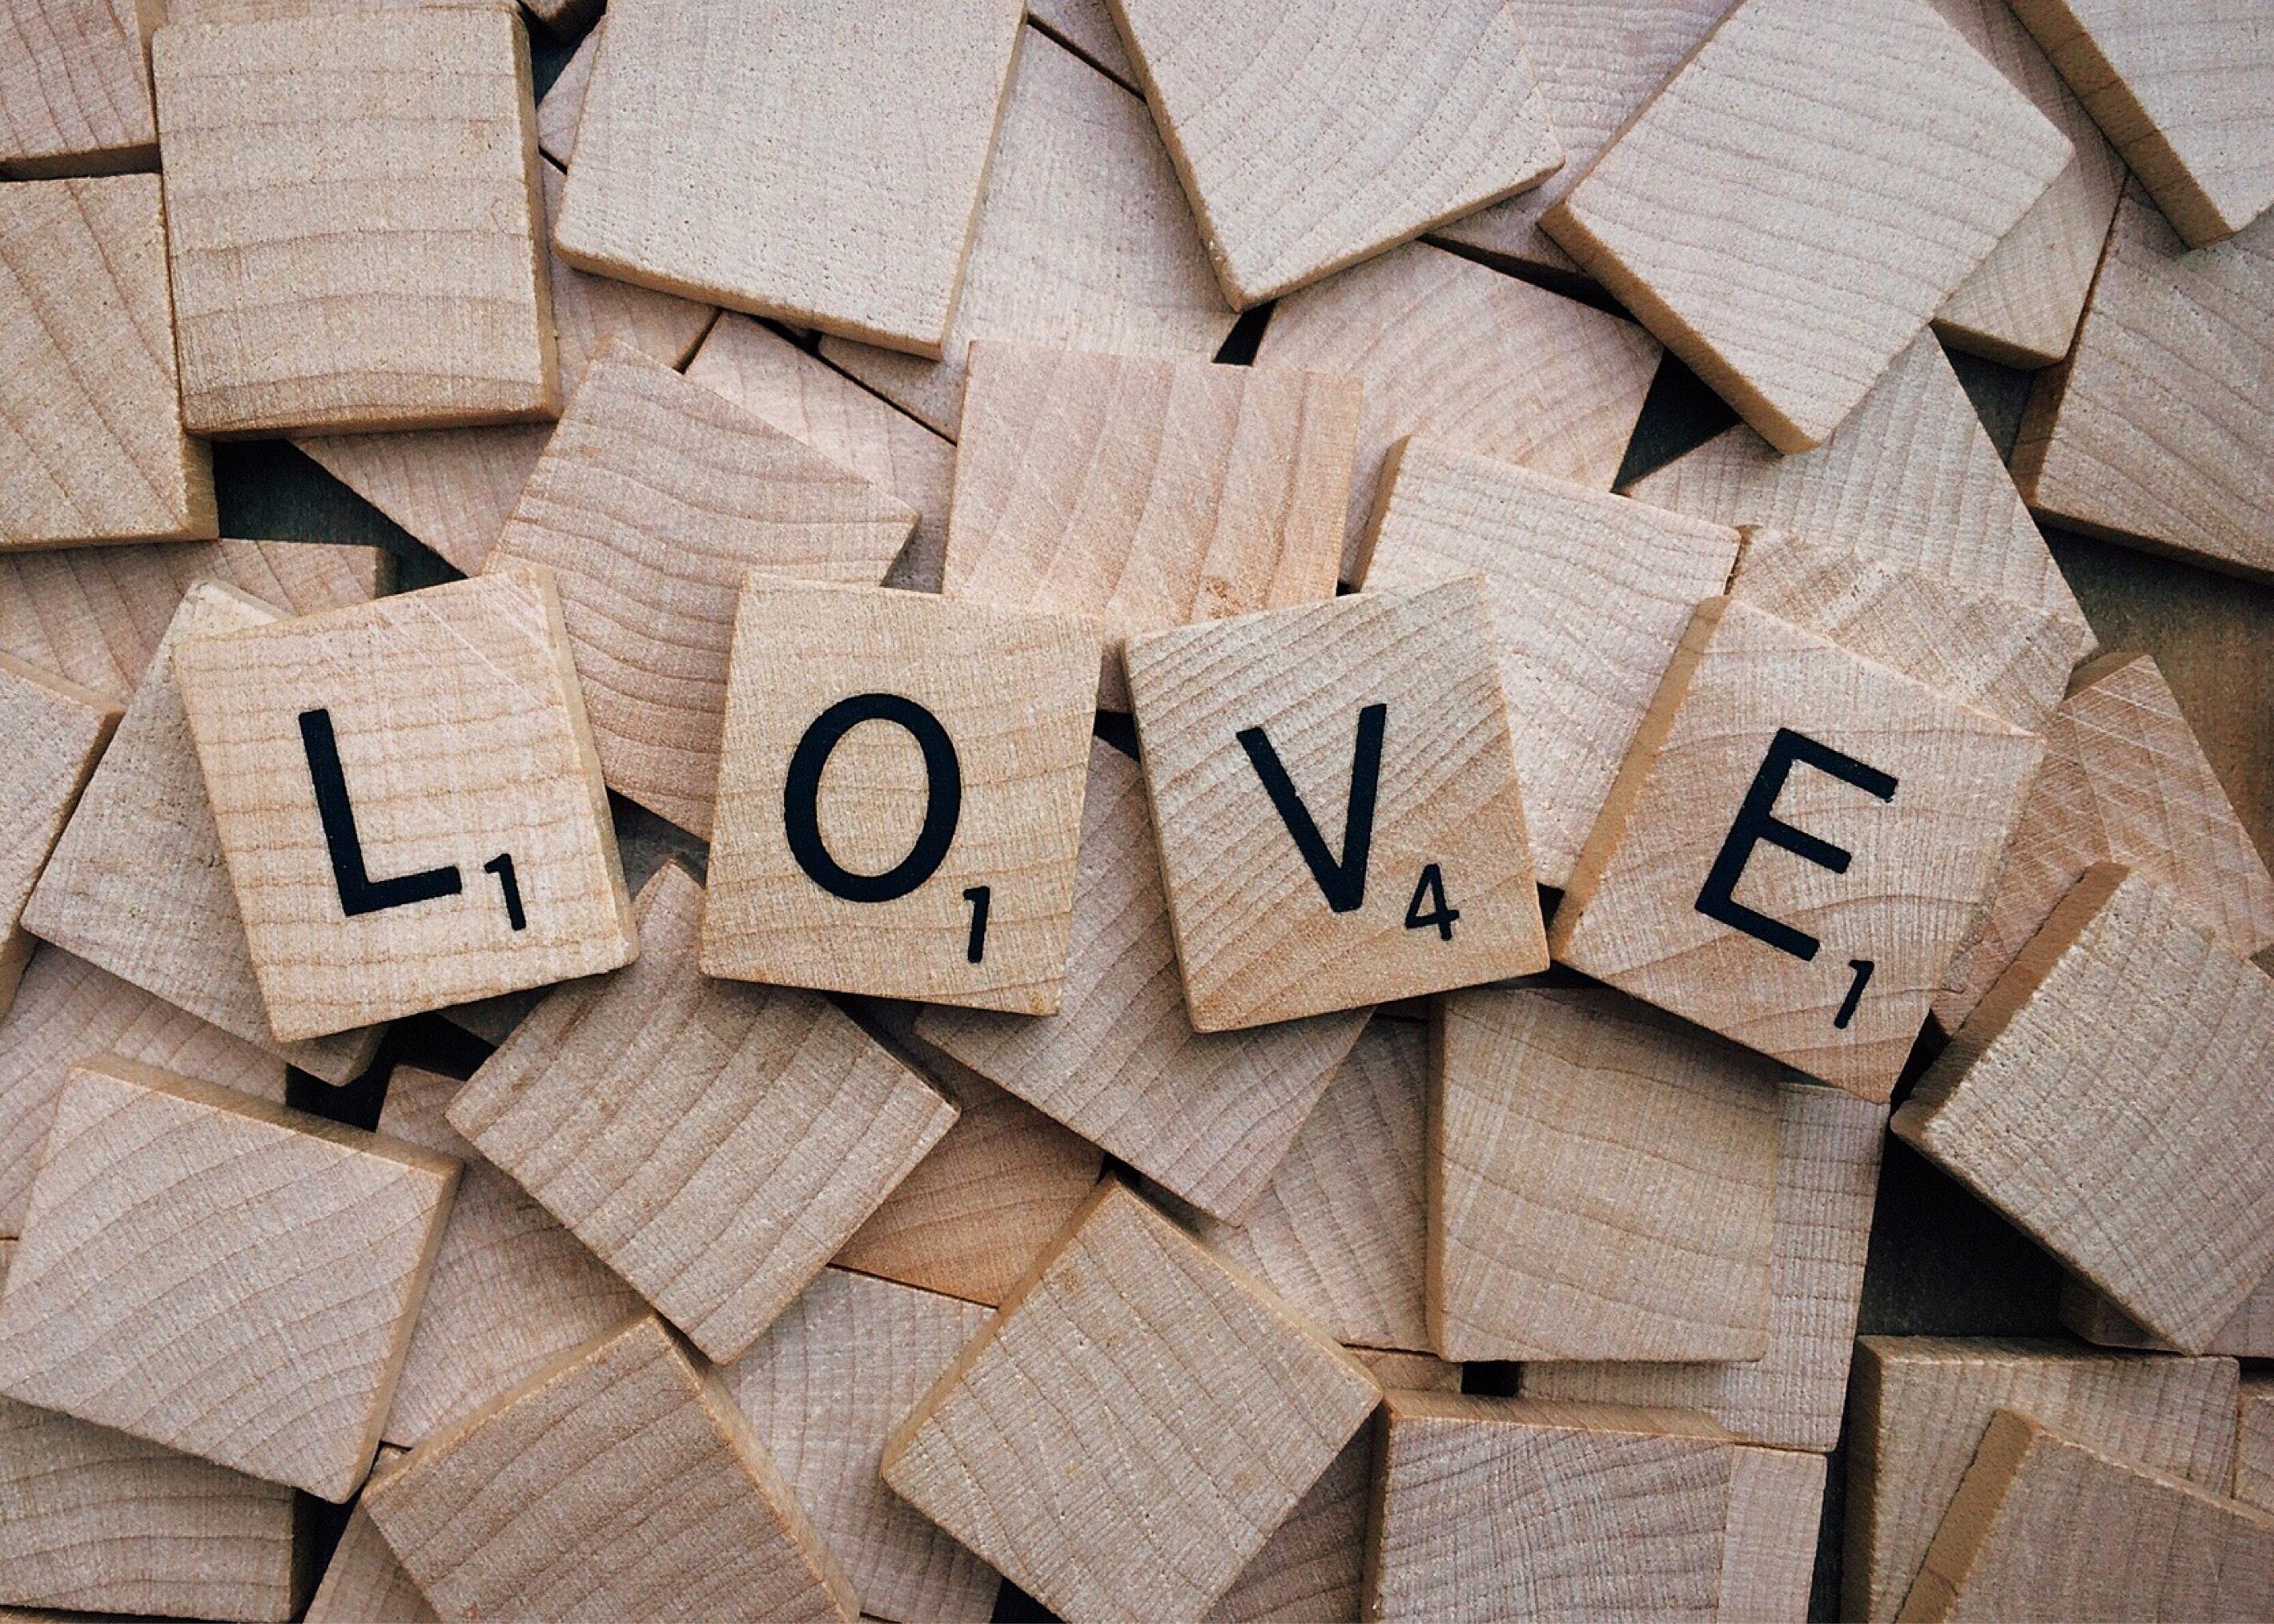 love-scrabble-text-wood-208099